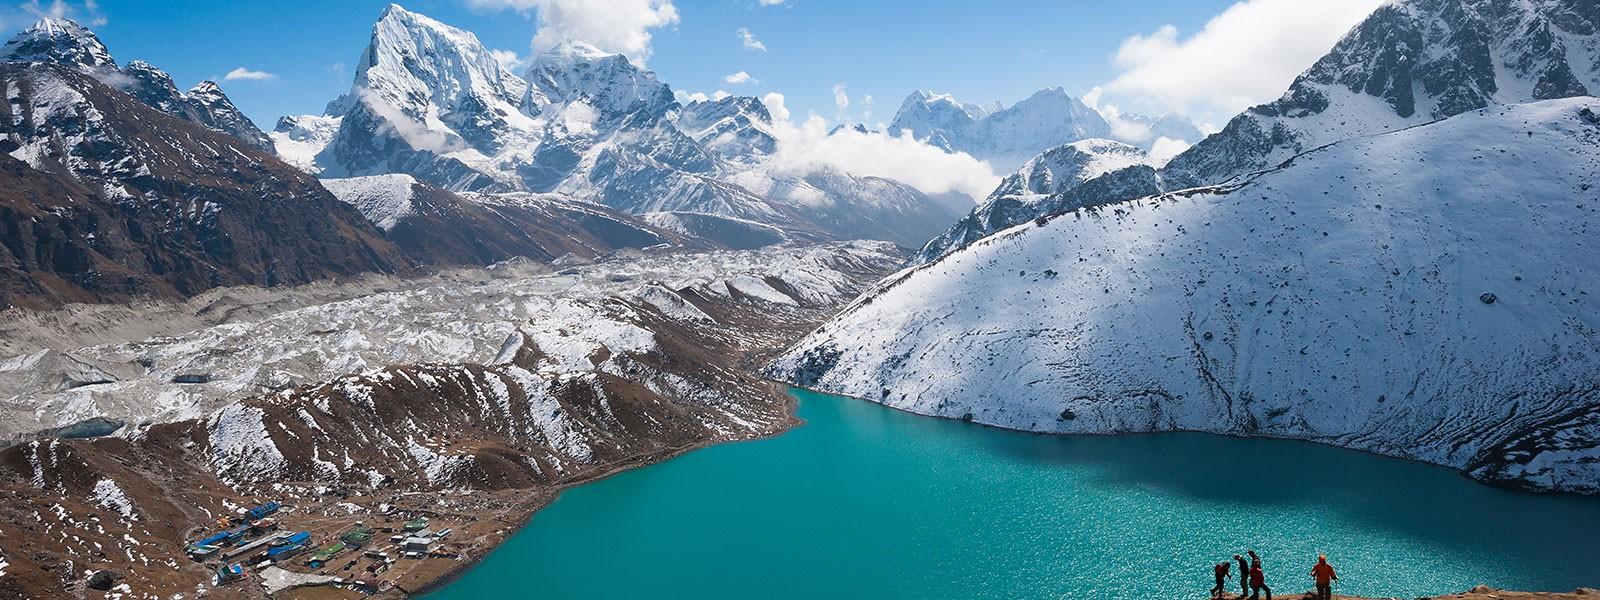 Everest Three Passes